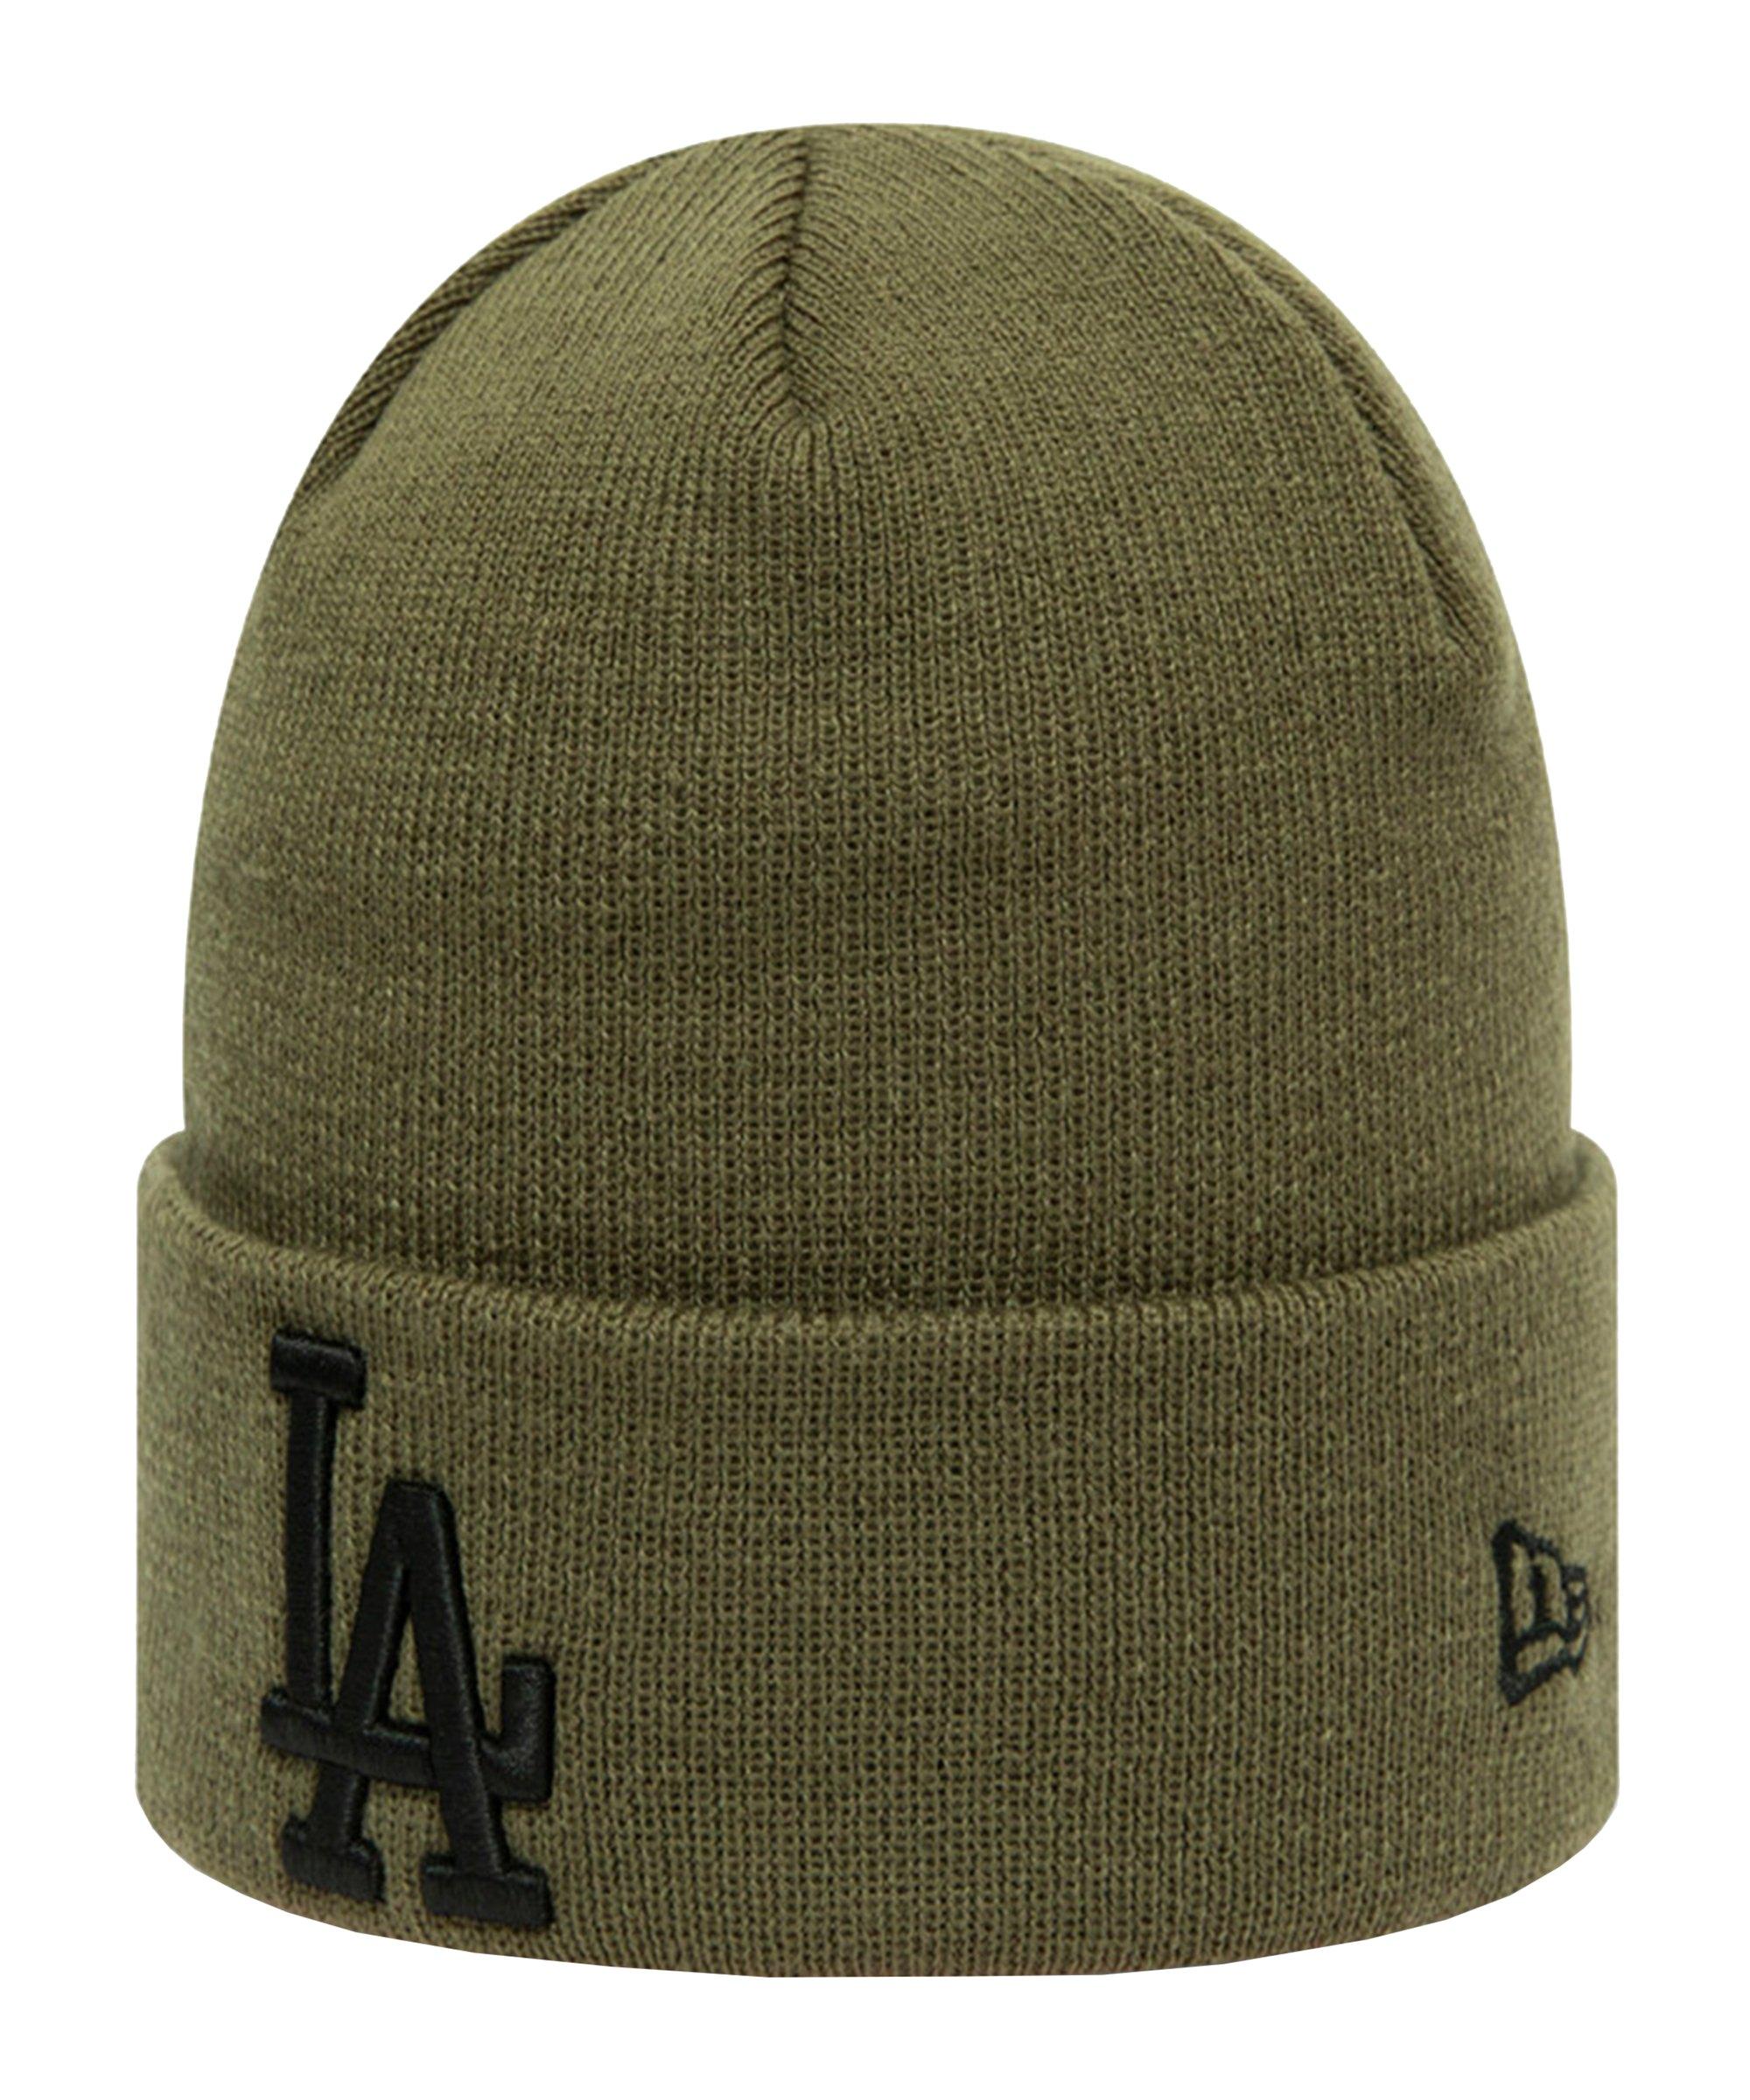 New Era LA Dodgers Cuff Beanie Grün FNOV - gruen